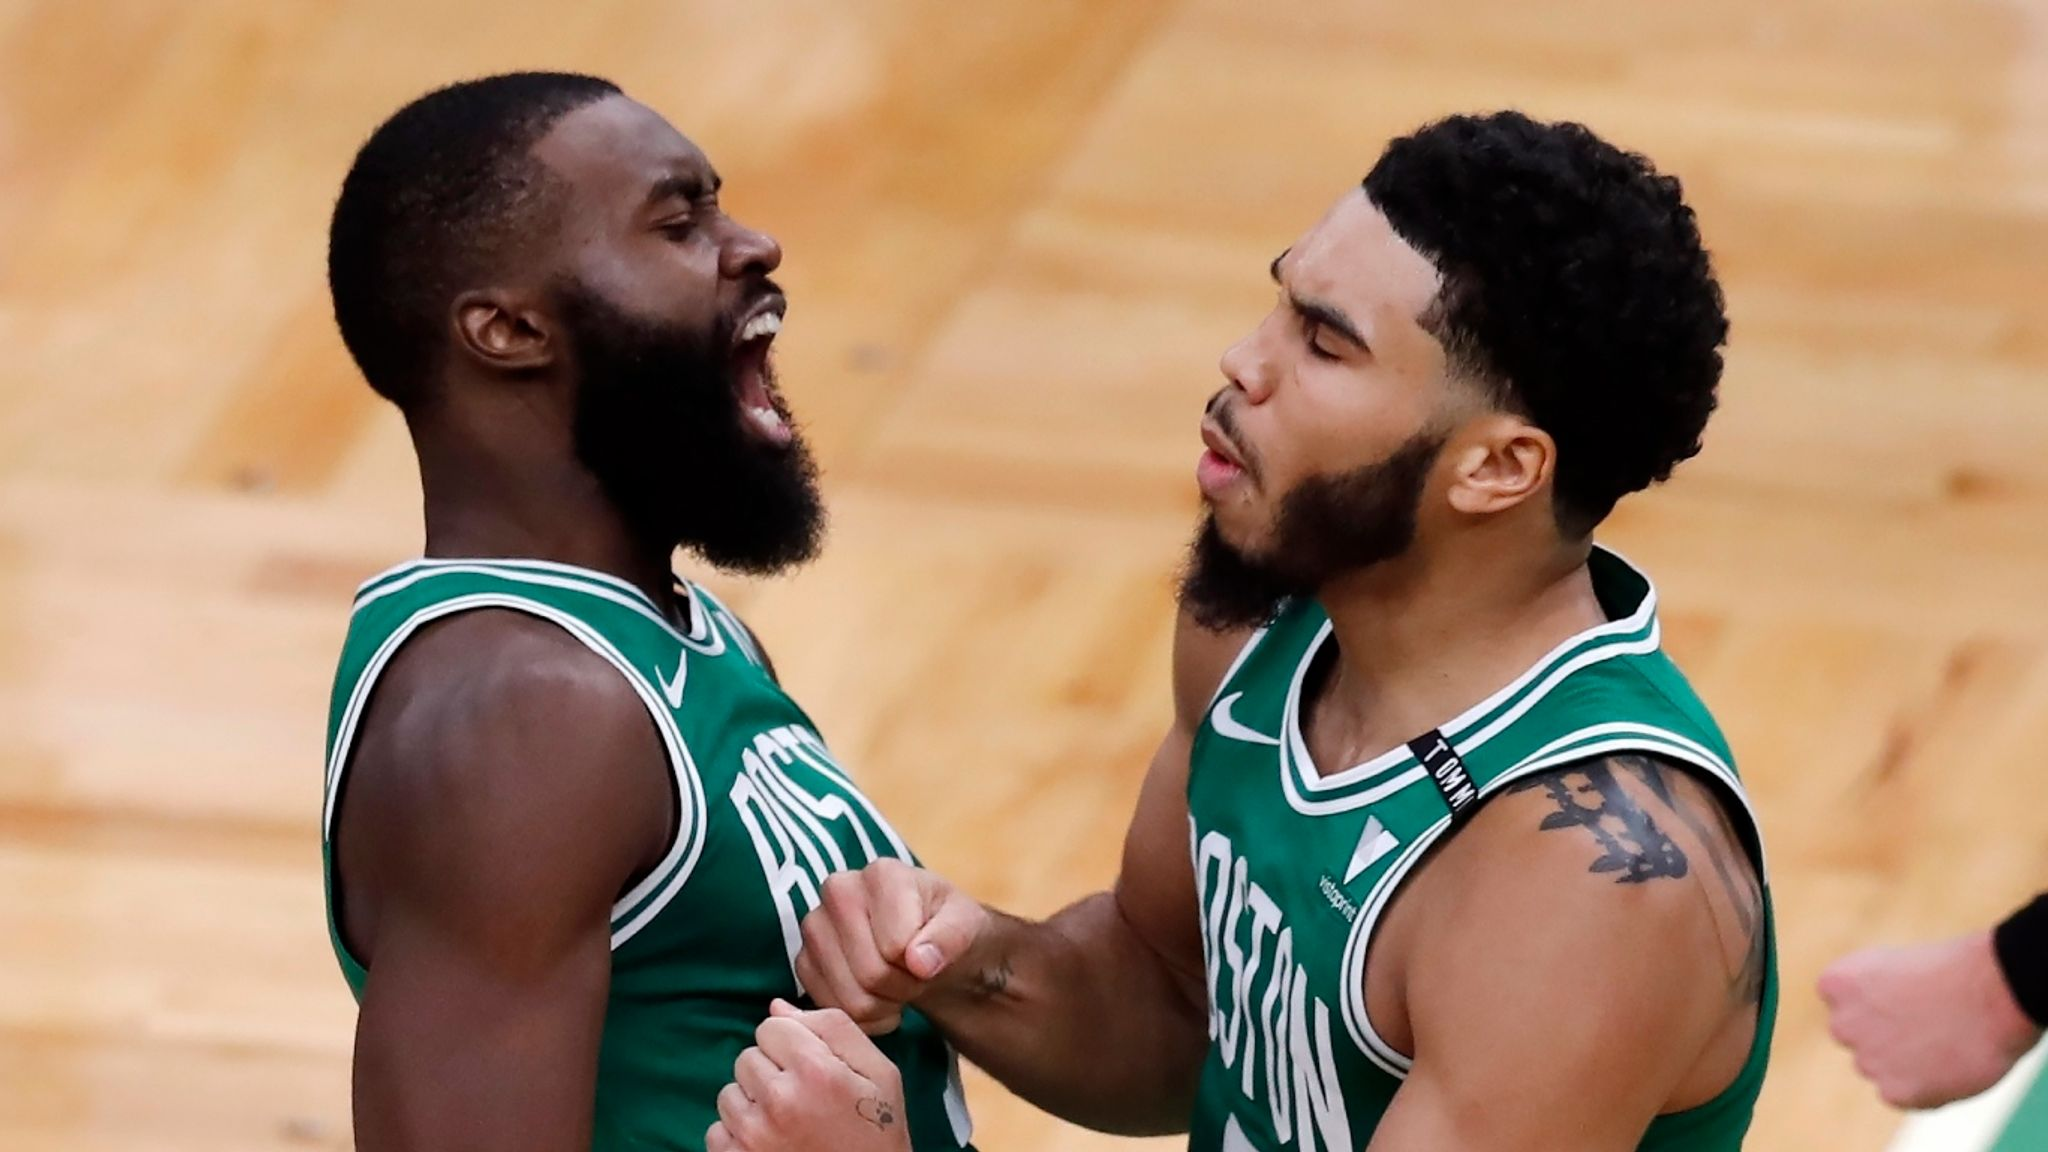 Boston Celtics Jayson Tatum Jaylen Brown Starring But Are Two Leaders Always Better Than One Nba News Sky Sports